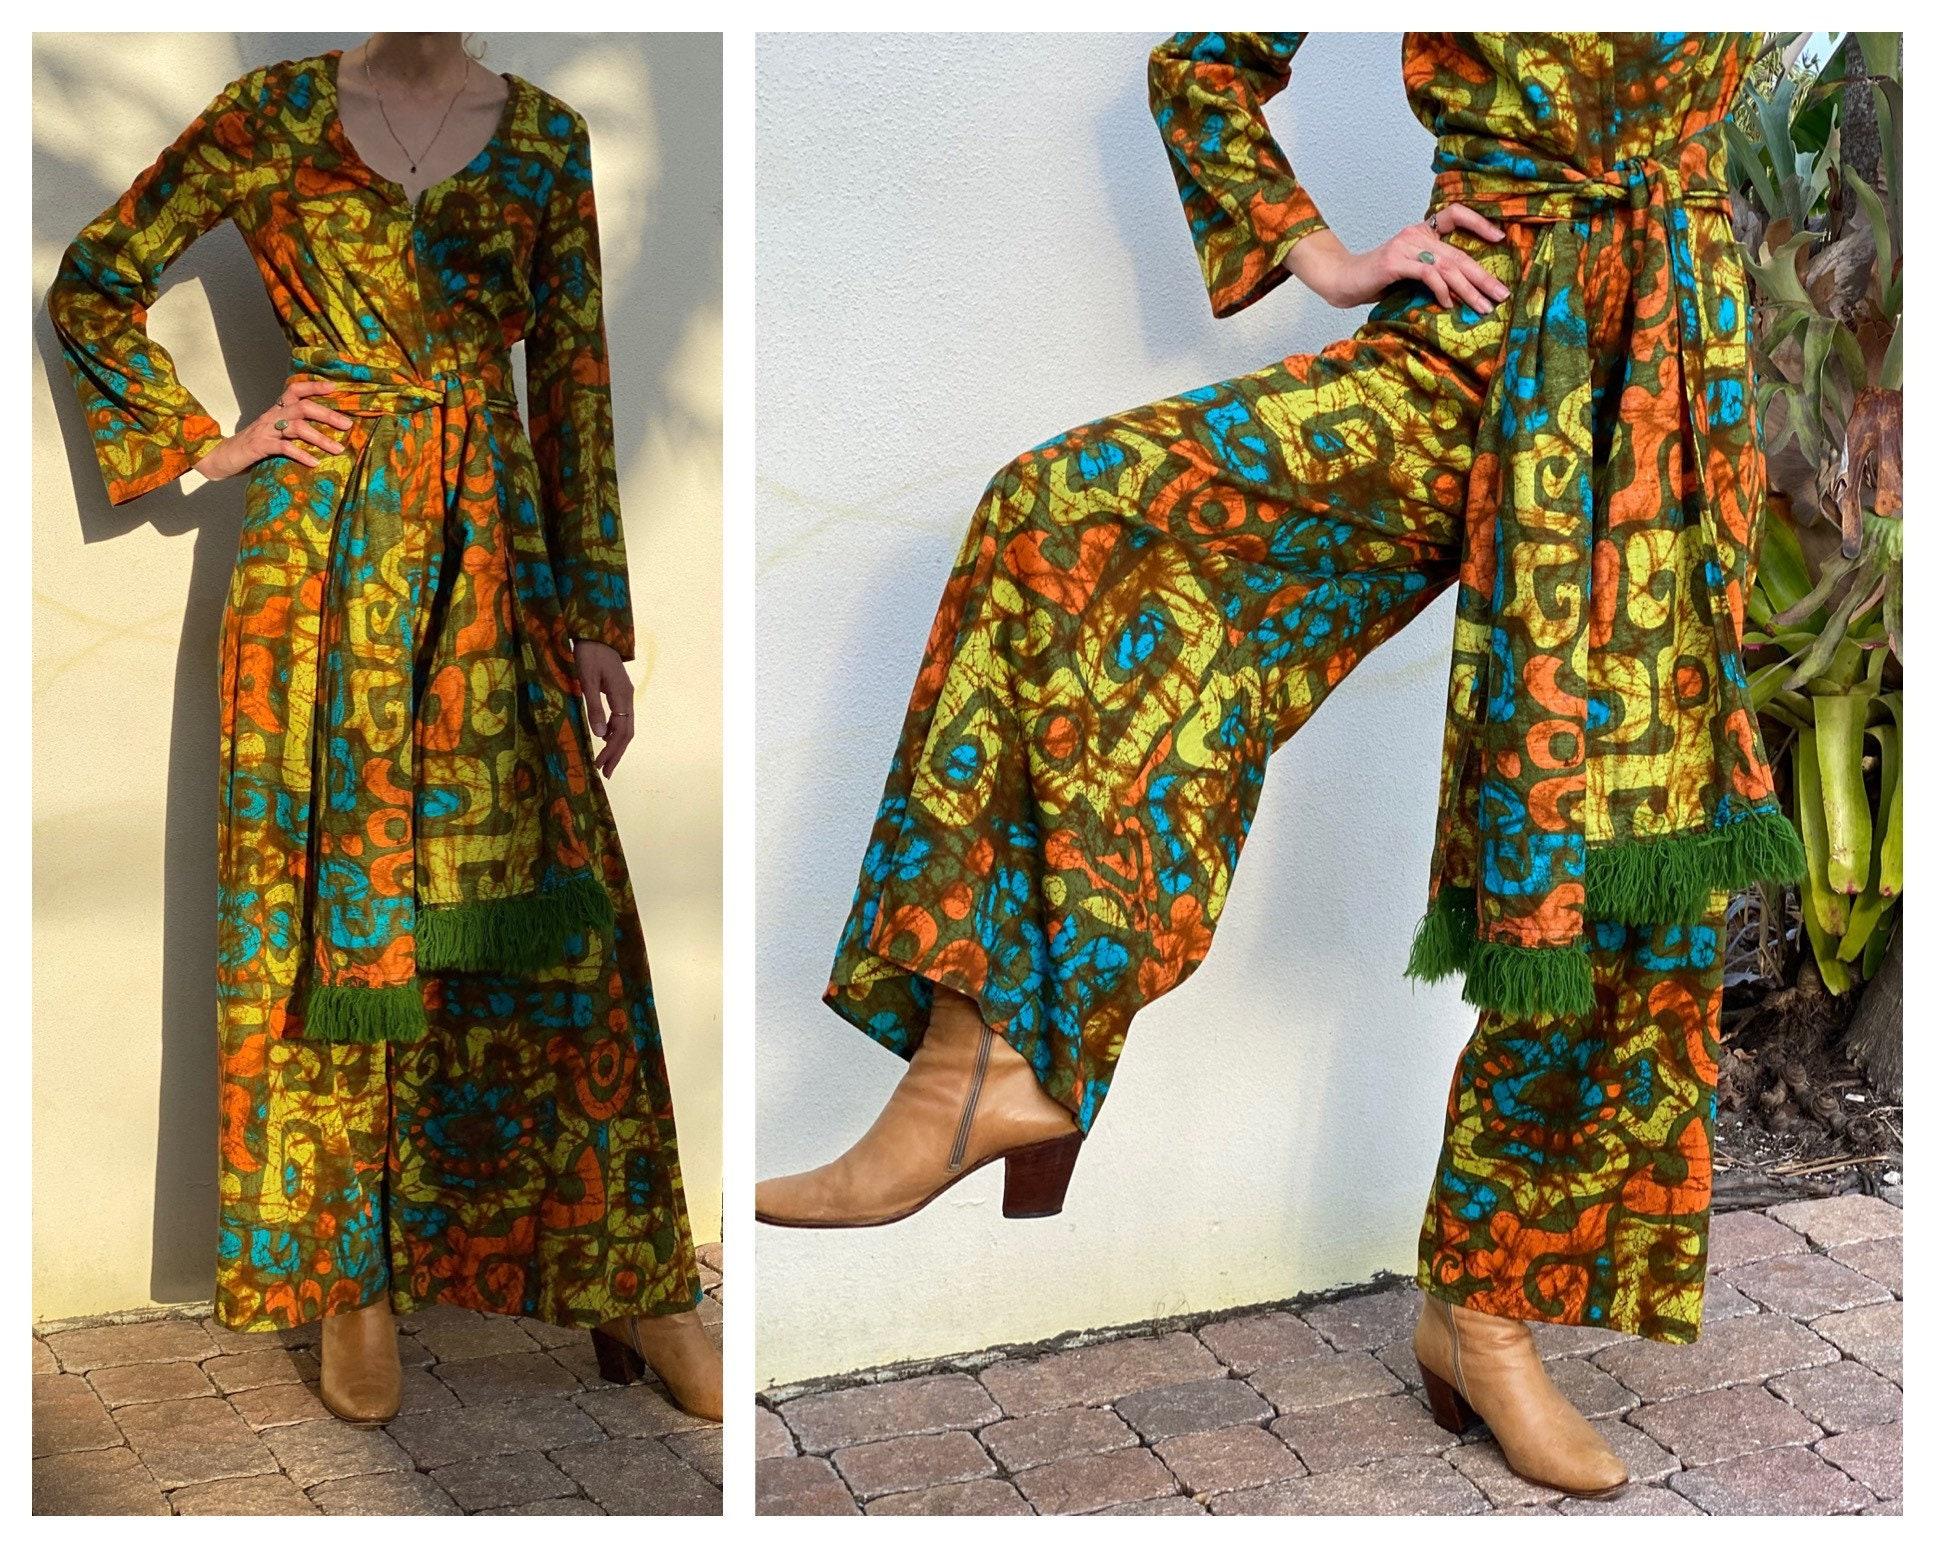 Vintage Scarf Styles -1920s to 1960s 1960S Wide Leg JumpsuitSixties Resort Wear Pantsuit Modern Mod Fabulous Printed Onesie With Fringe SashHead Scarf $40.00 AT vintagedancer.com